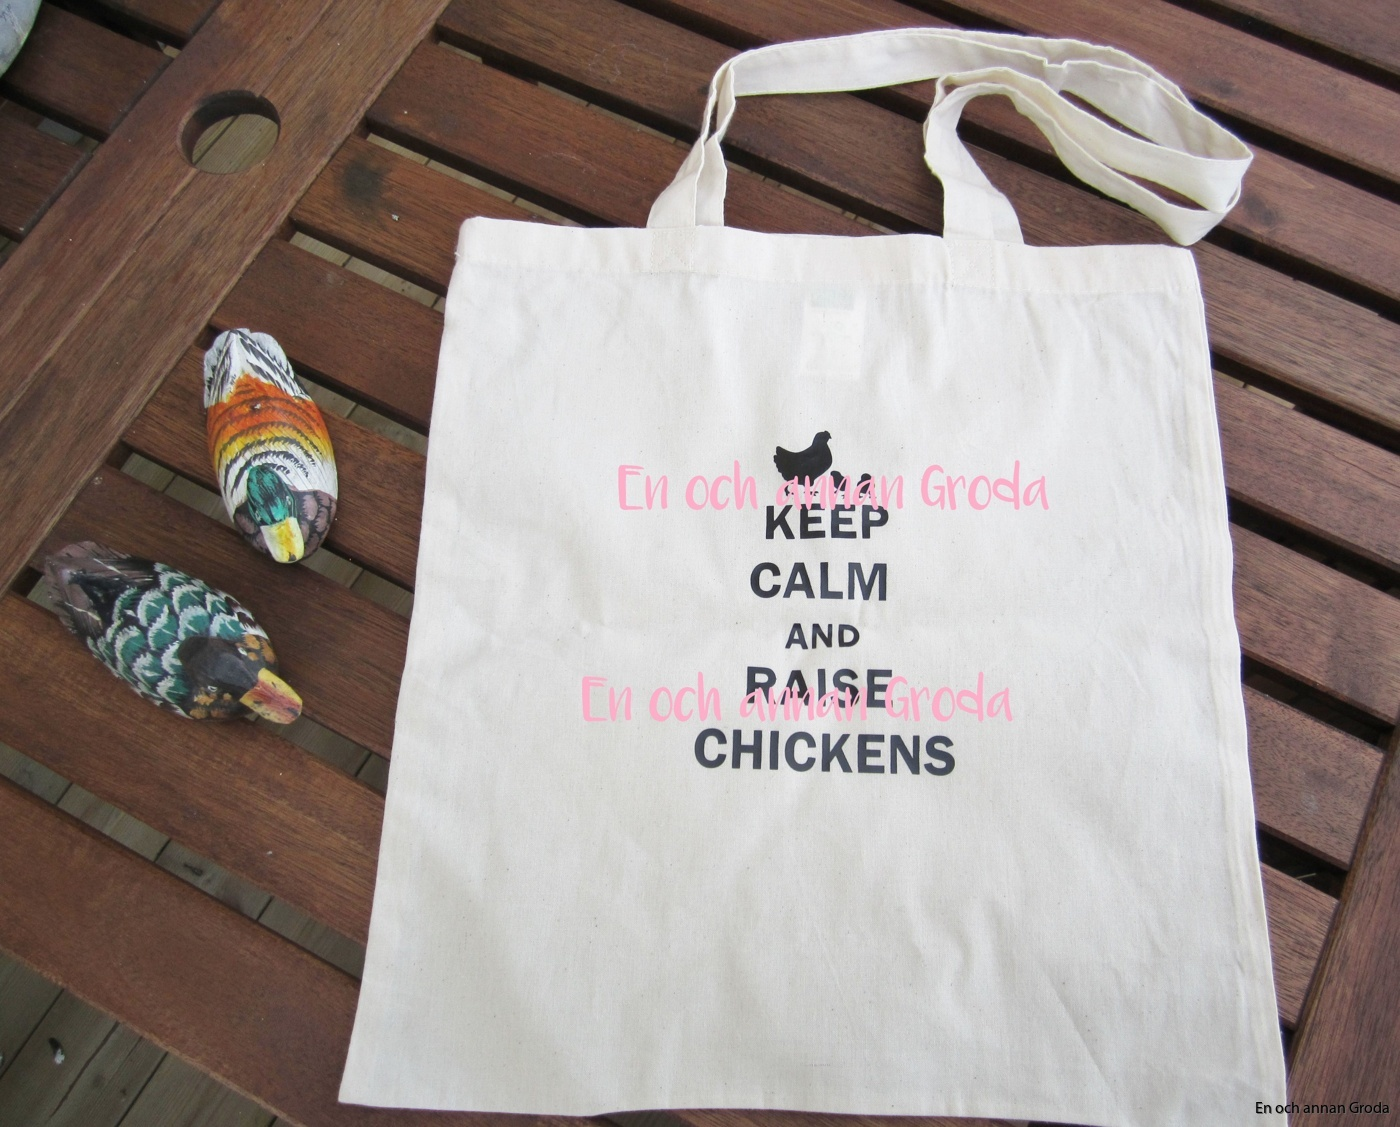 kasse keep calm chickens #2